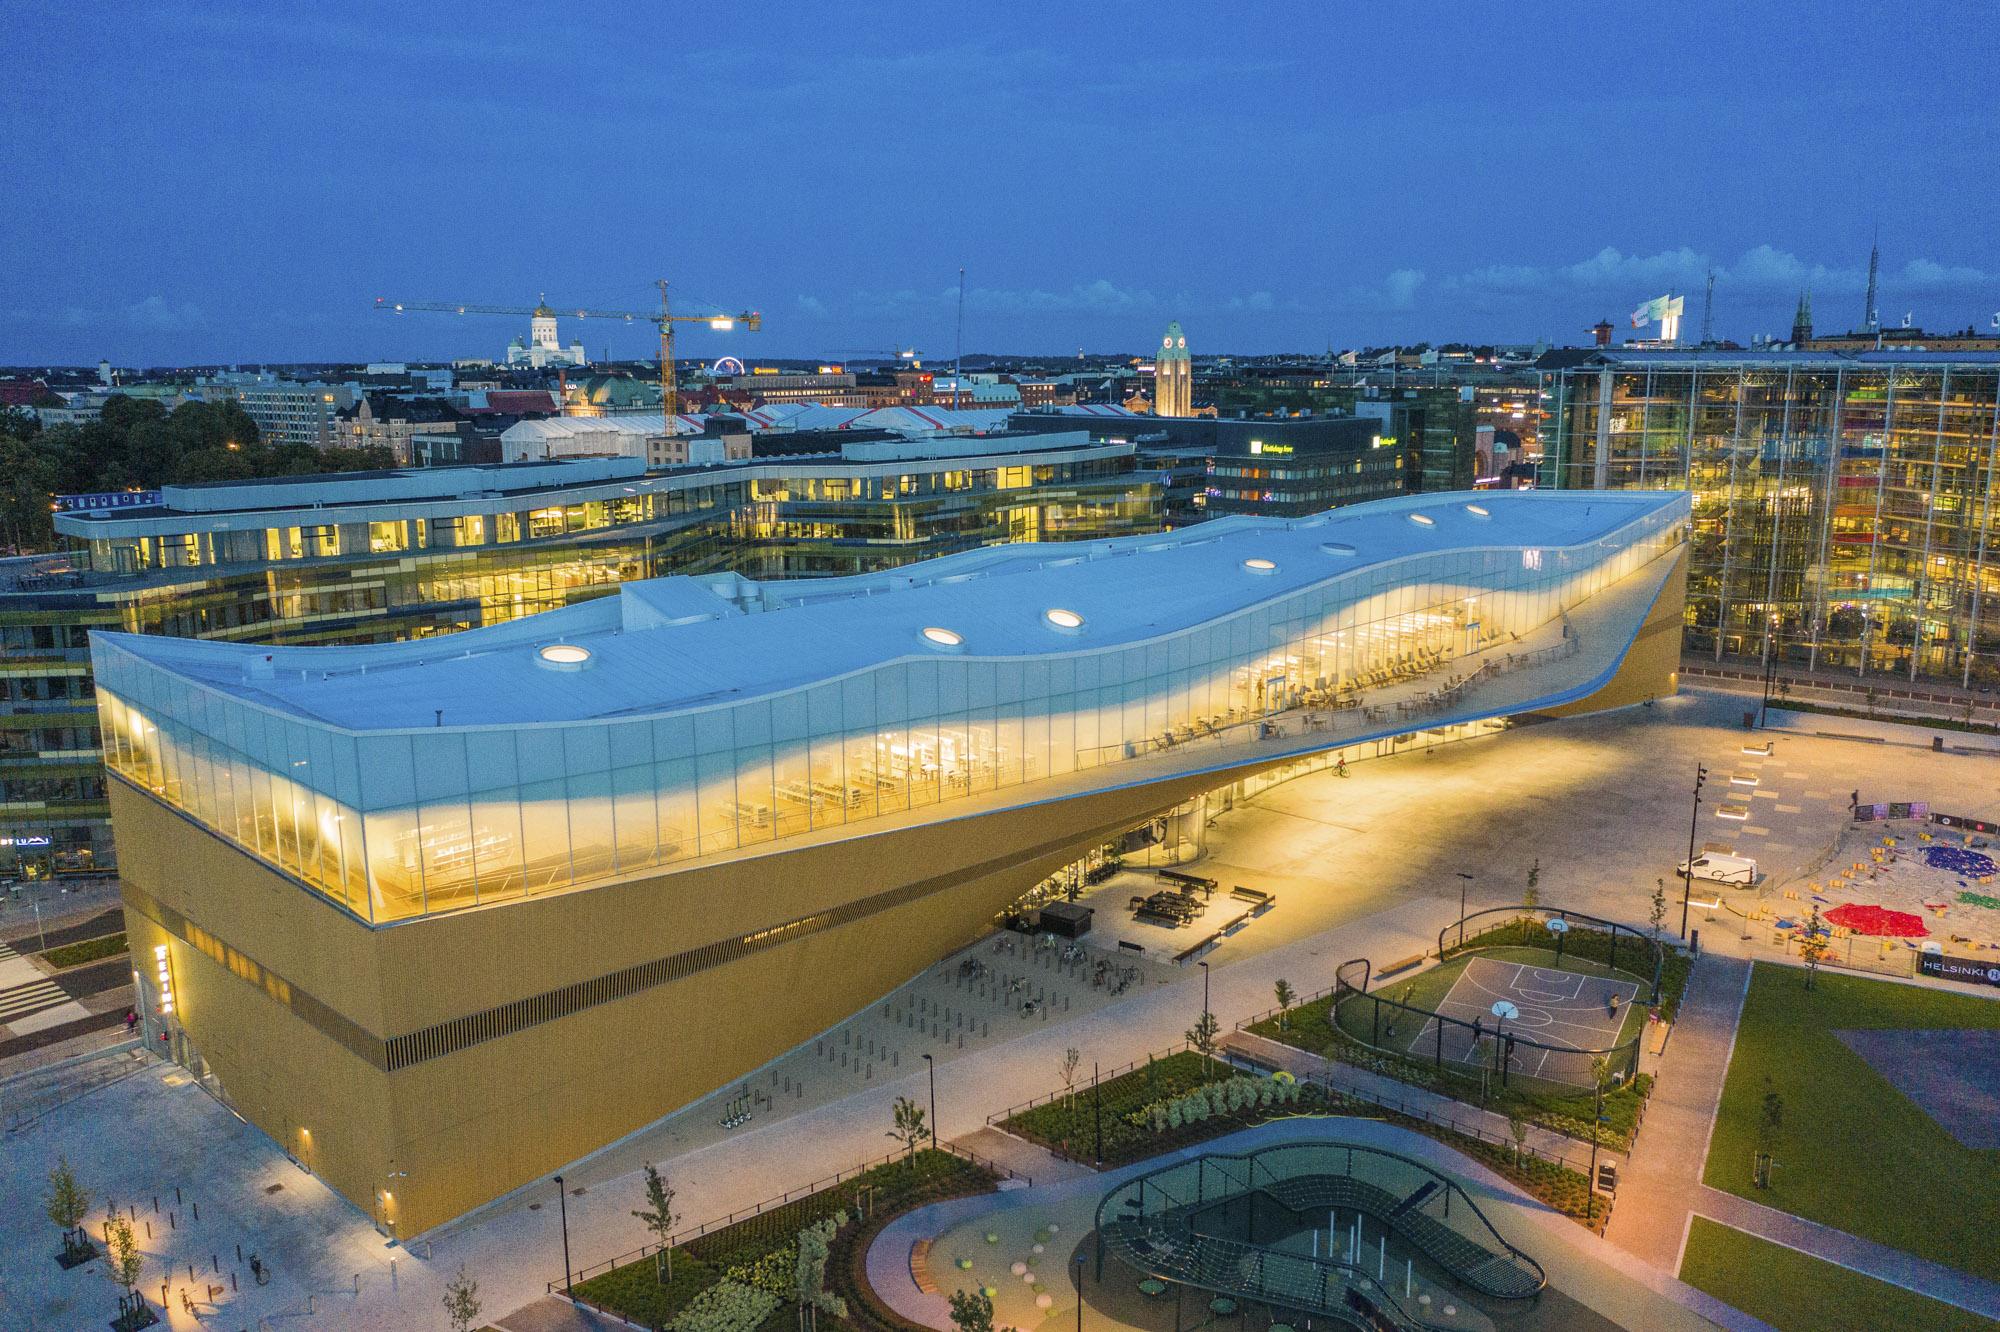 Finnland, Helsinki, Zentralbibliothek Oodi, Gebäude bei NAcht, Architekten: ALA Architekts, Luftaufnahme